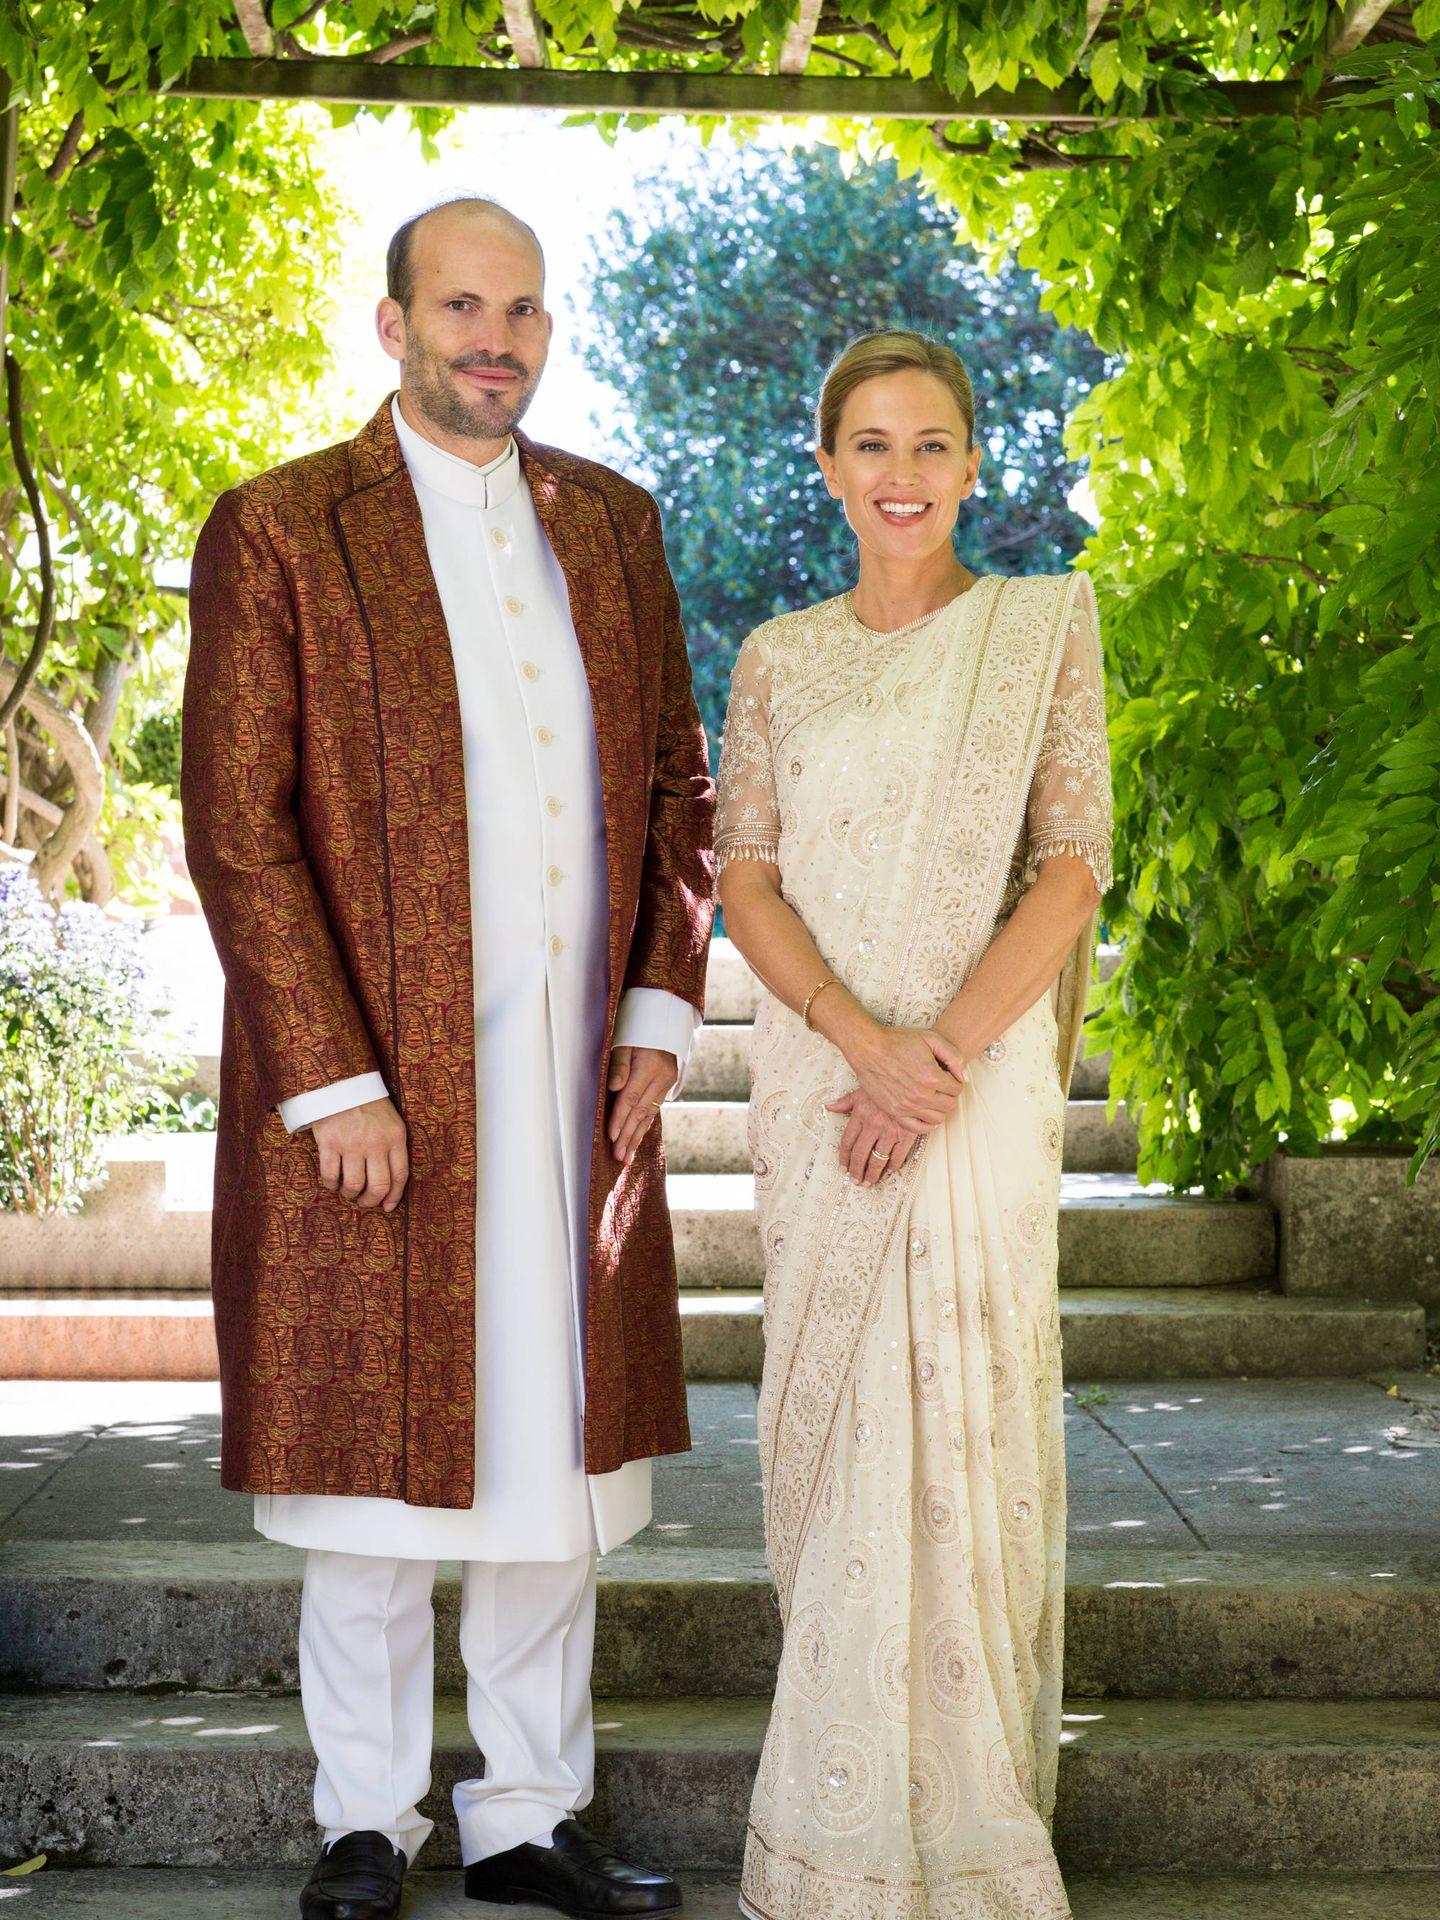 Hussain Aga Khan y su mujer, Fareed. (The Ismaili / Facebook)